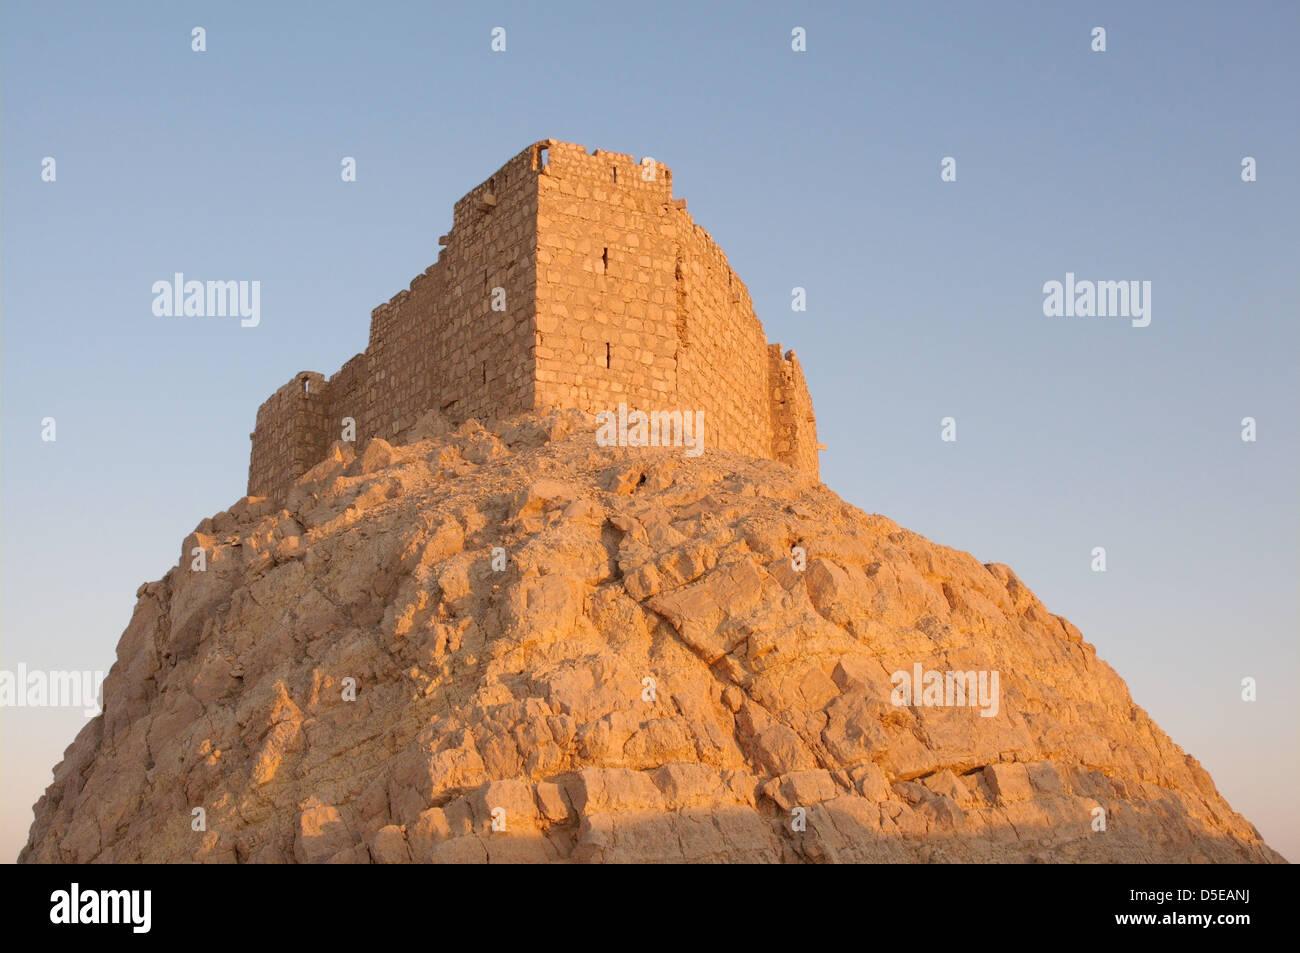 Medieval Arab fortress - Qala'at Ibn Maan (Ibn Maan castle, Fakhr al-Din al-Maani Castle), Palmyra, Syria - Stock Image